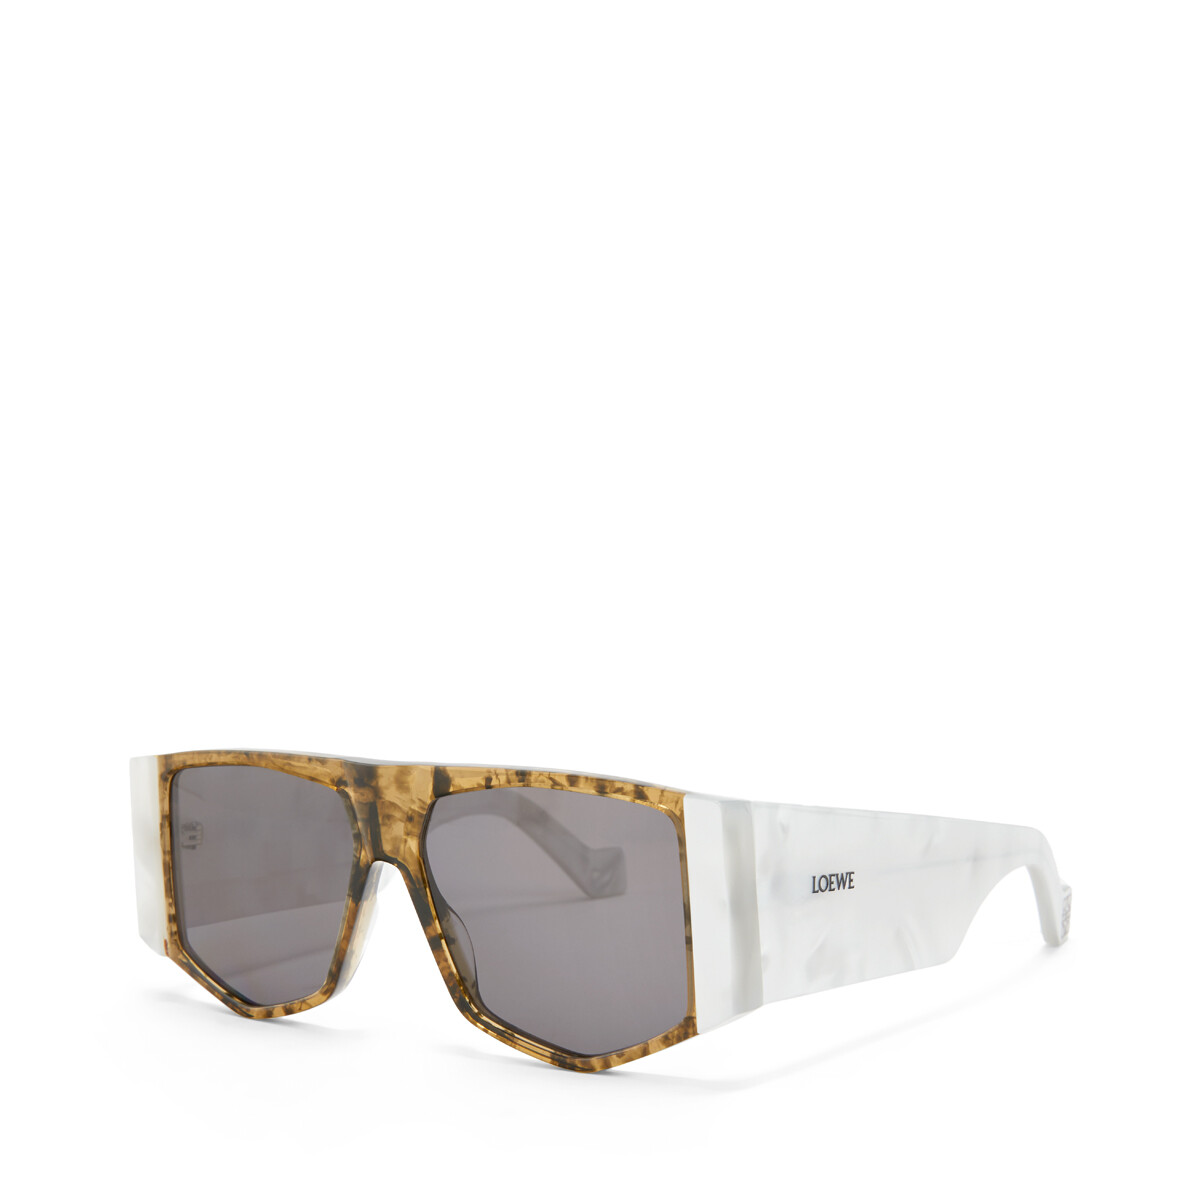 LOEWE Acetate Mask Sunglasses White/Smoke front